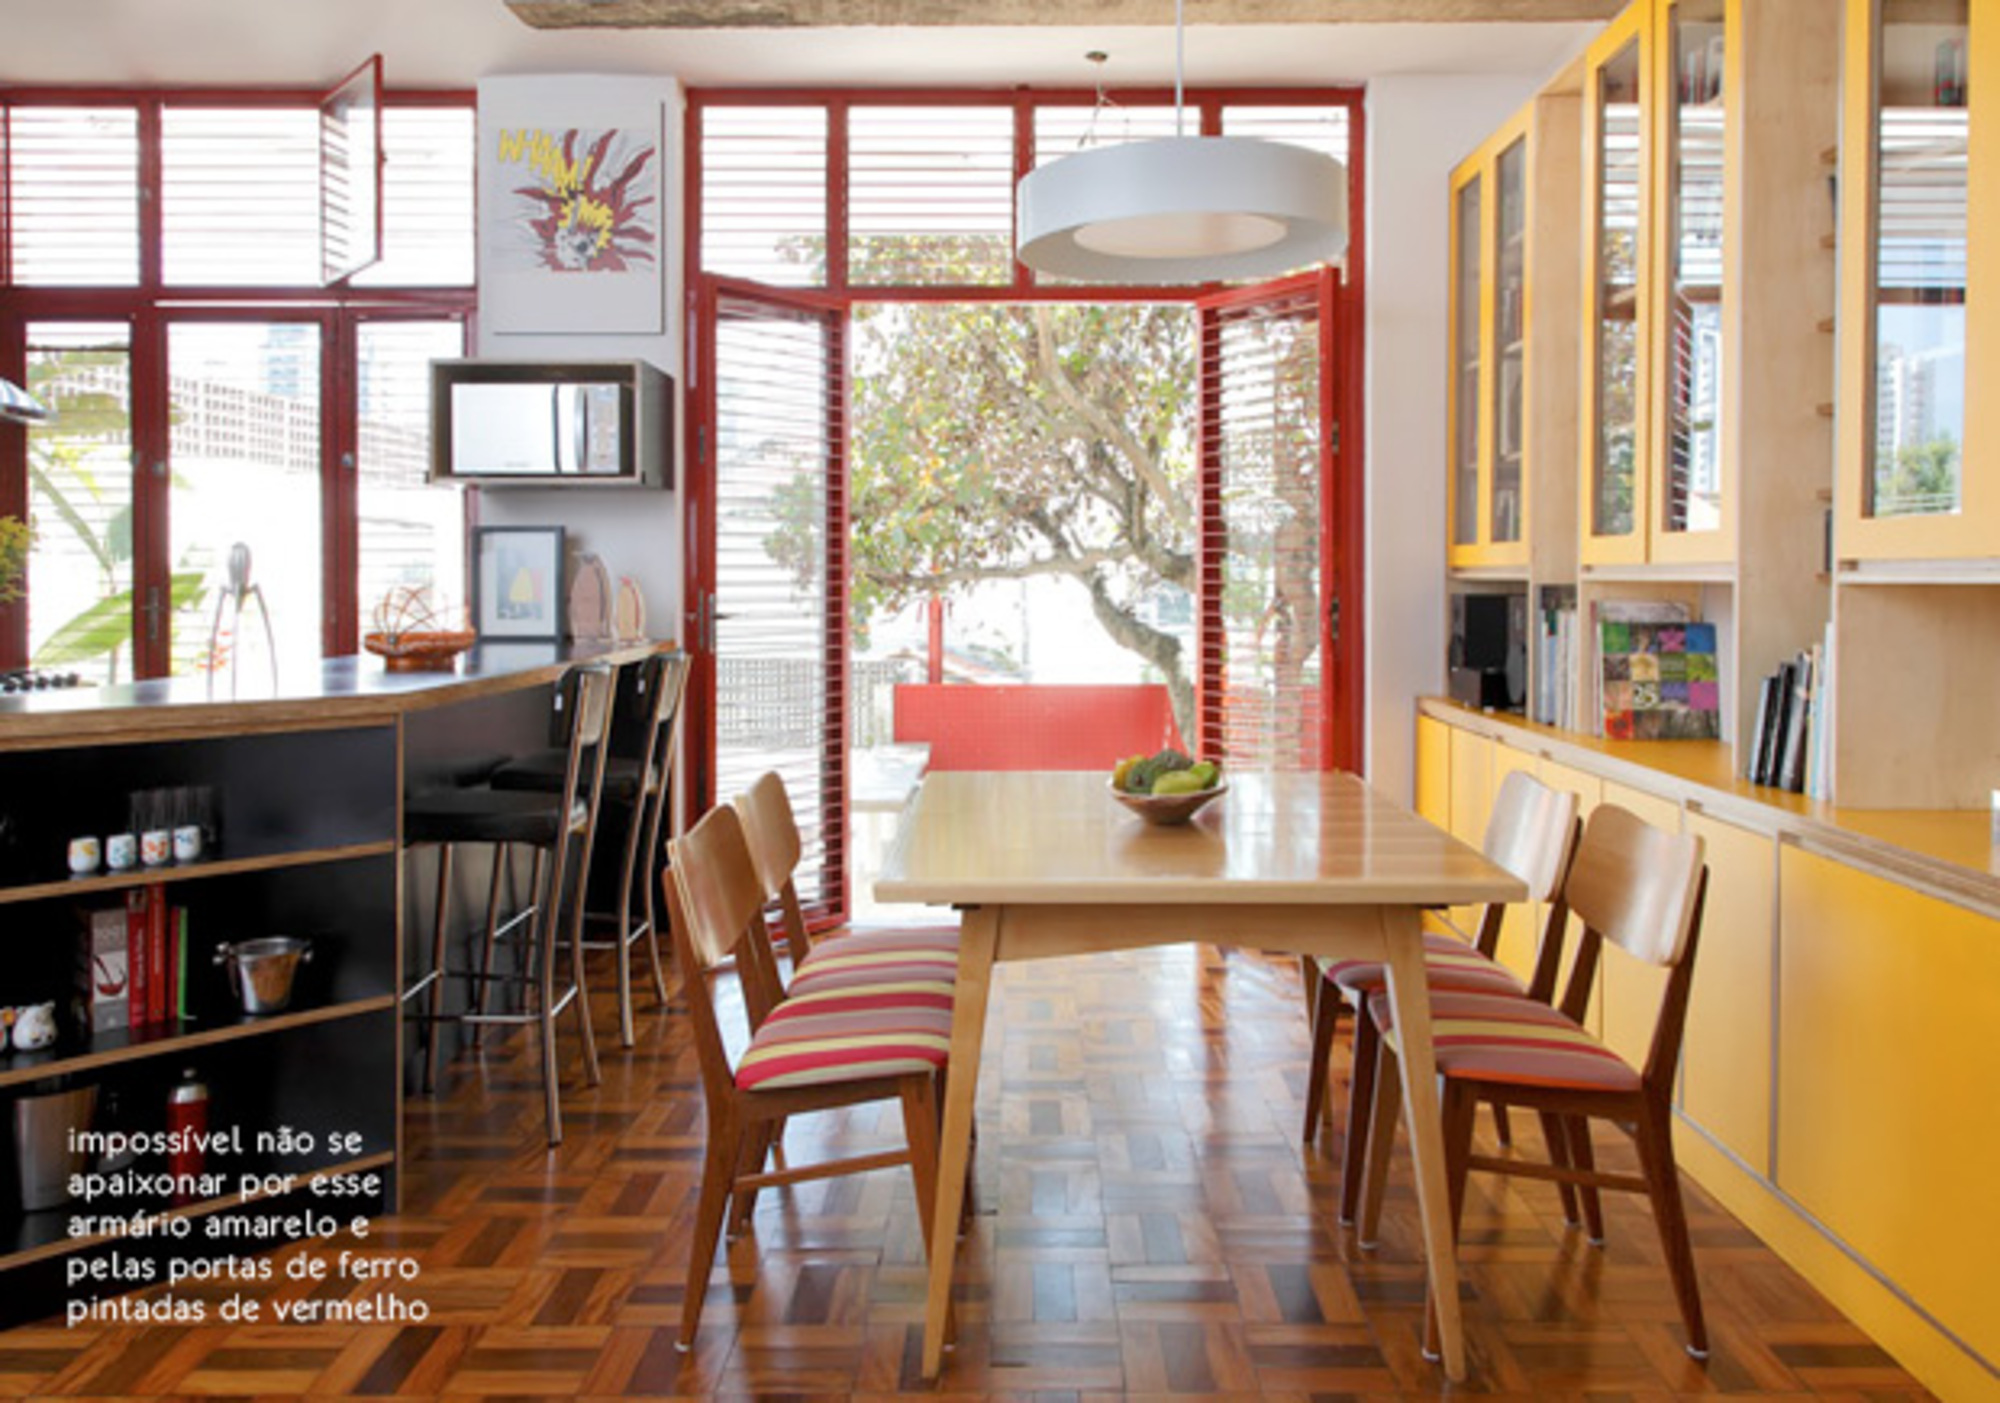 A Sala De Jantar Perfeita Casa De Valentina -> Cores Parede Sala Jantar